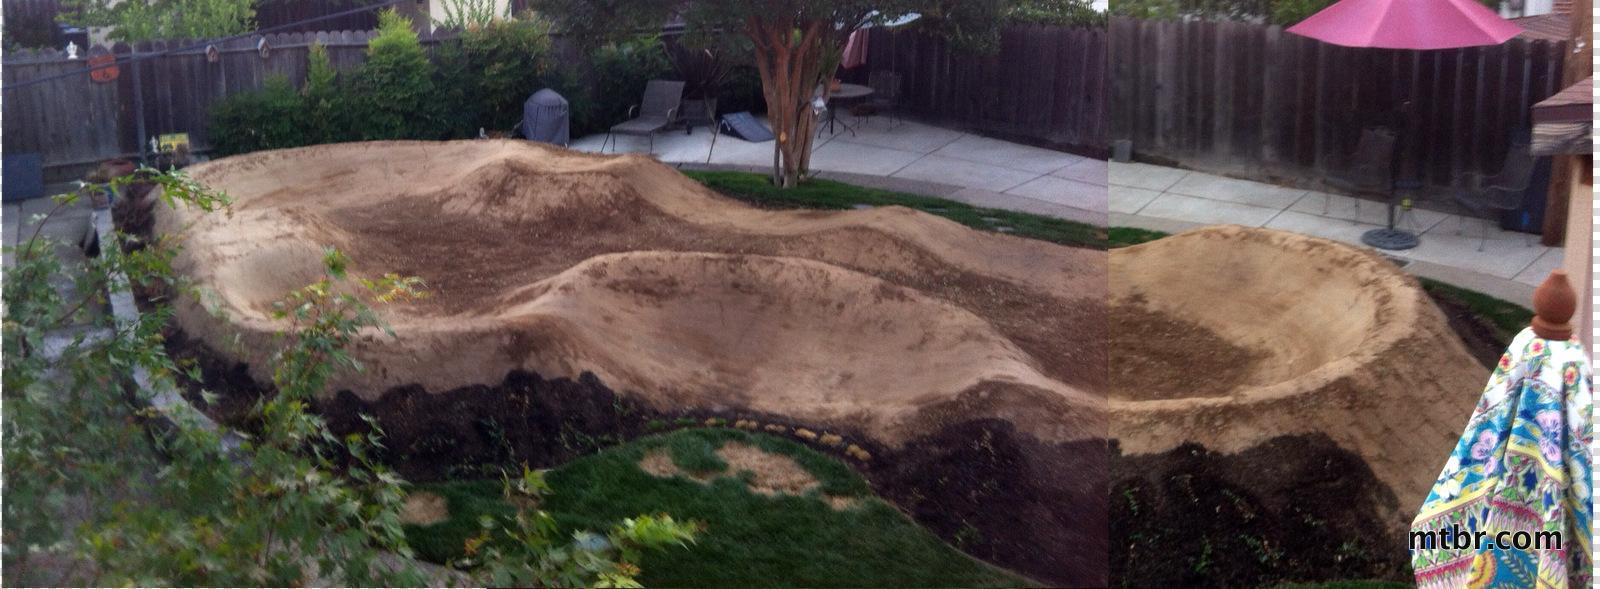 Backyard Pumptrack feature: the backyard pump track - construction- mtbr | page 2